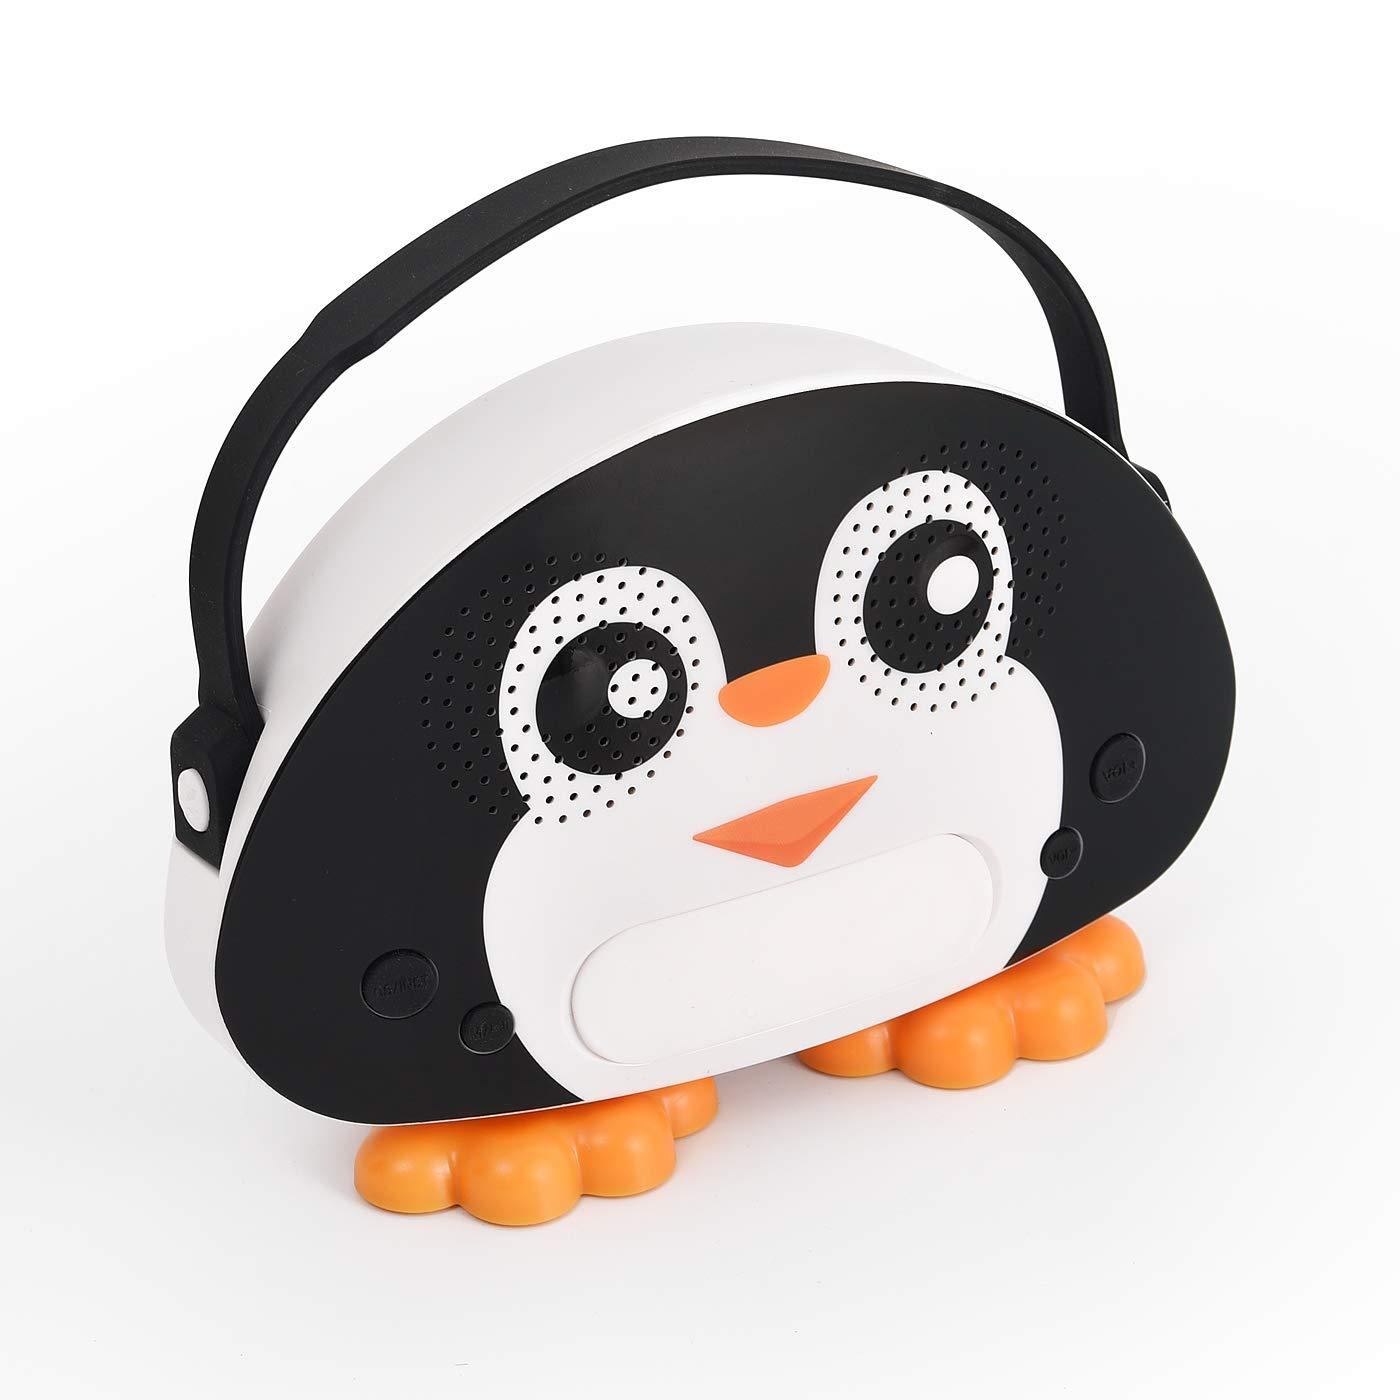 HowQ Outdoor Toys Karaoke Machine , Portable Kids Karaoke Bluetooth Speaker Wireless Cartoon Speaker for Kids for Indoor Toys Travel Activities with Microphone Penguin Karaoke Machine(Black-White) by HowQ (Image #3)